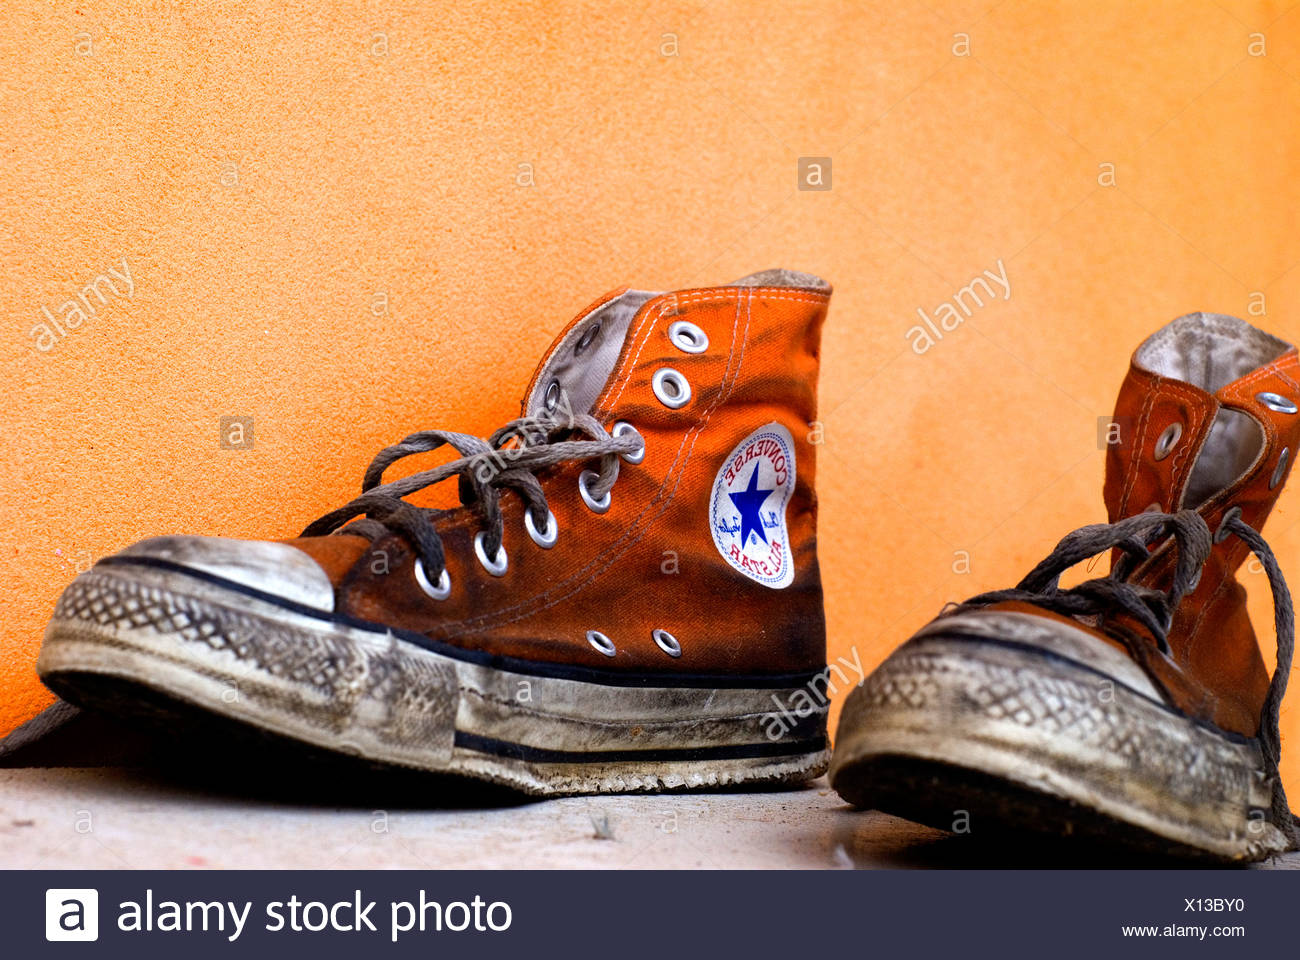 d6d3791b602 Viejas y sucias zapatos Converse All Star naranja sobre un fondo naranja